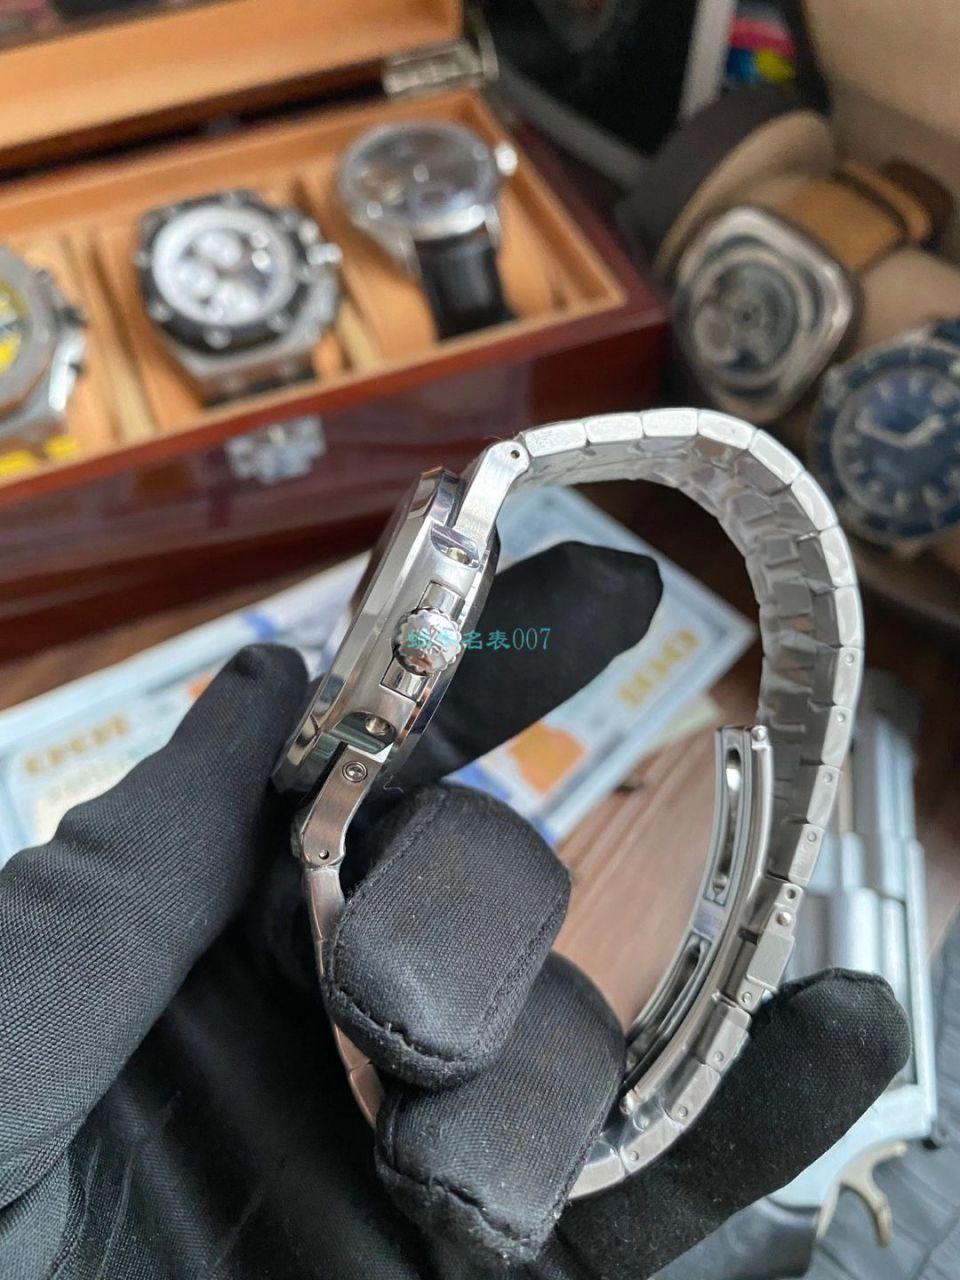 PF厂百达翡丽鹦鹉螺5712/1A-001 一比一顶级复刻手表 / BD352